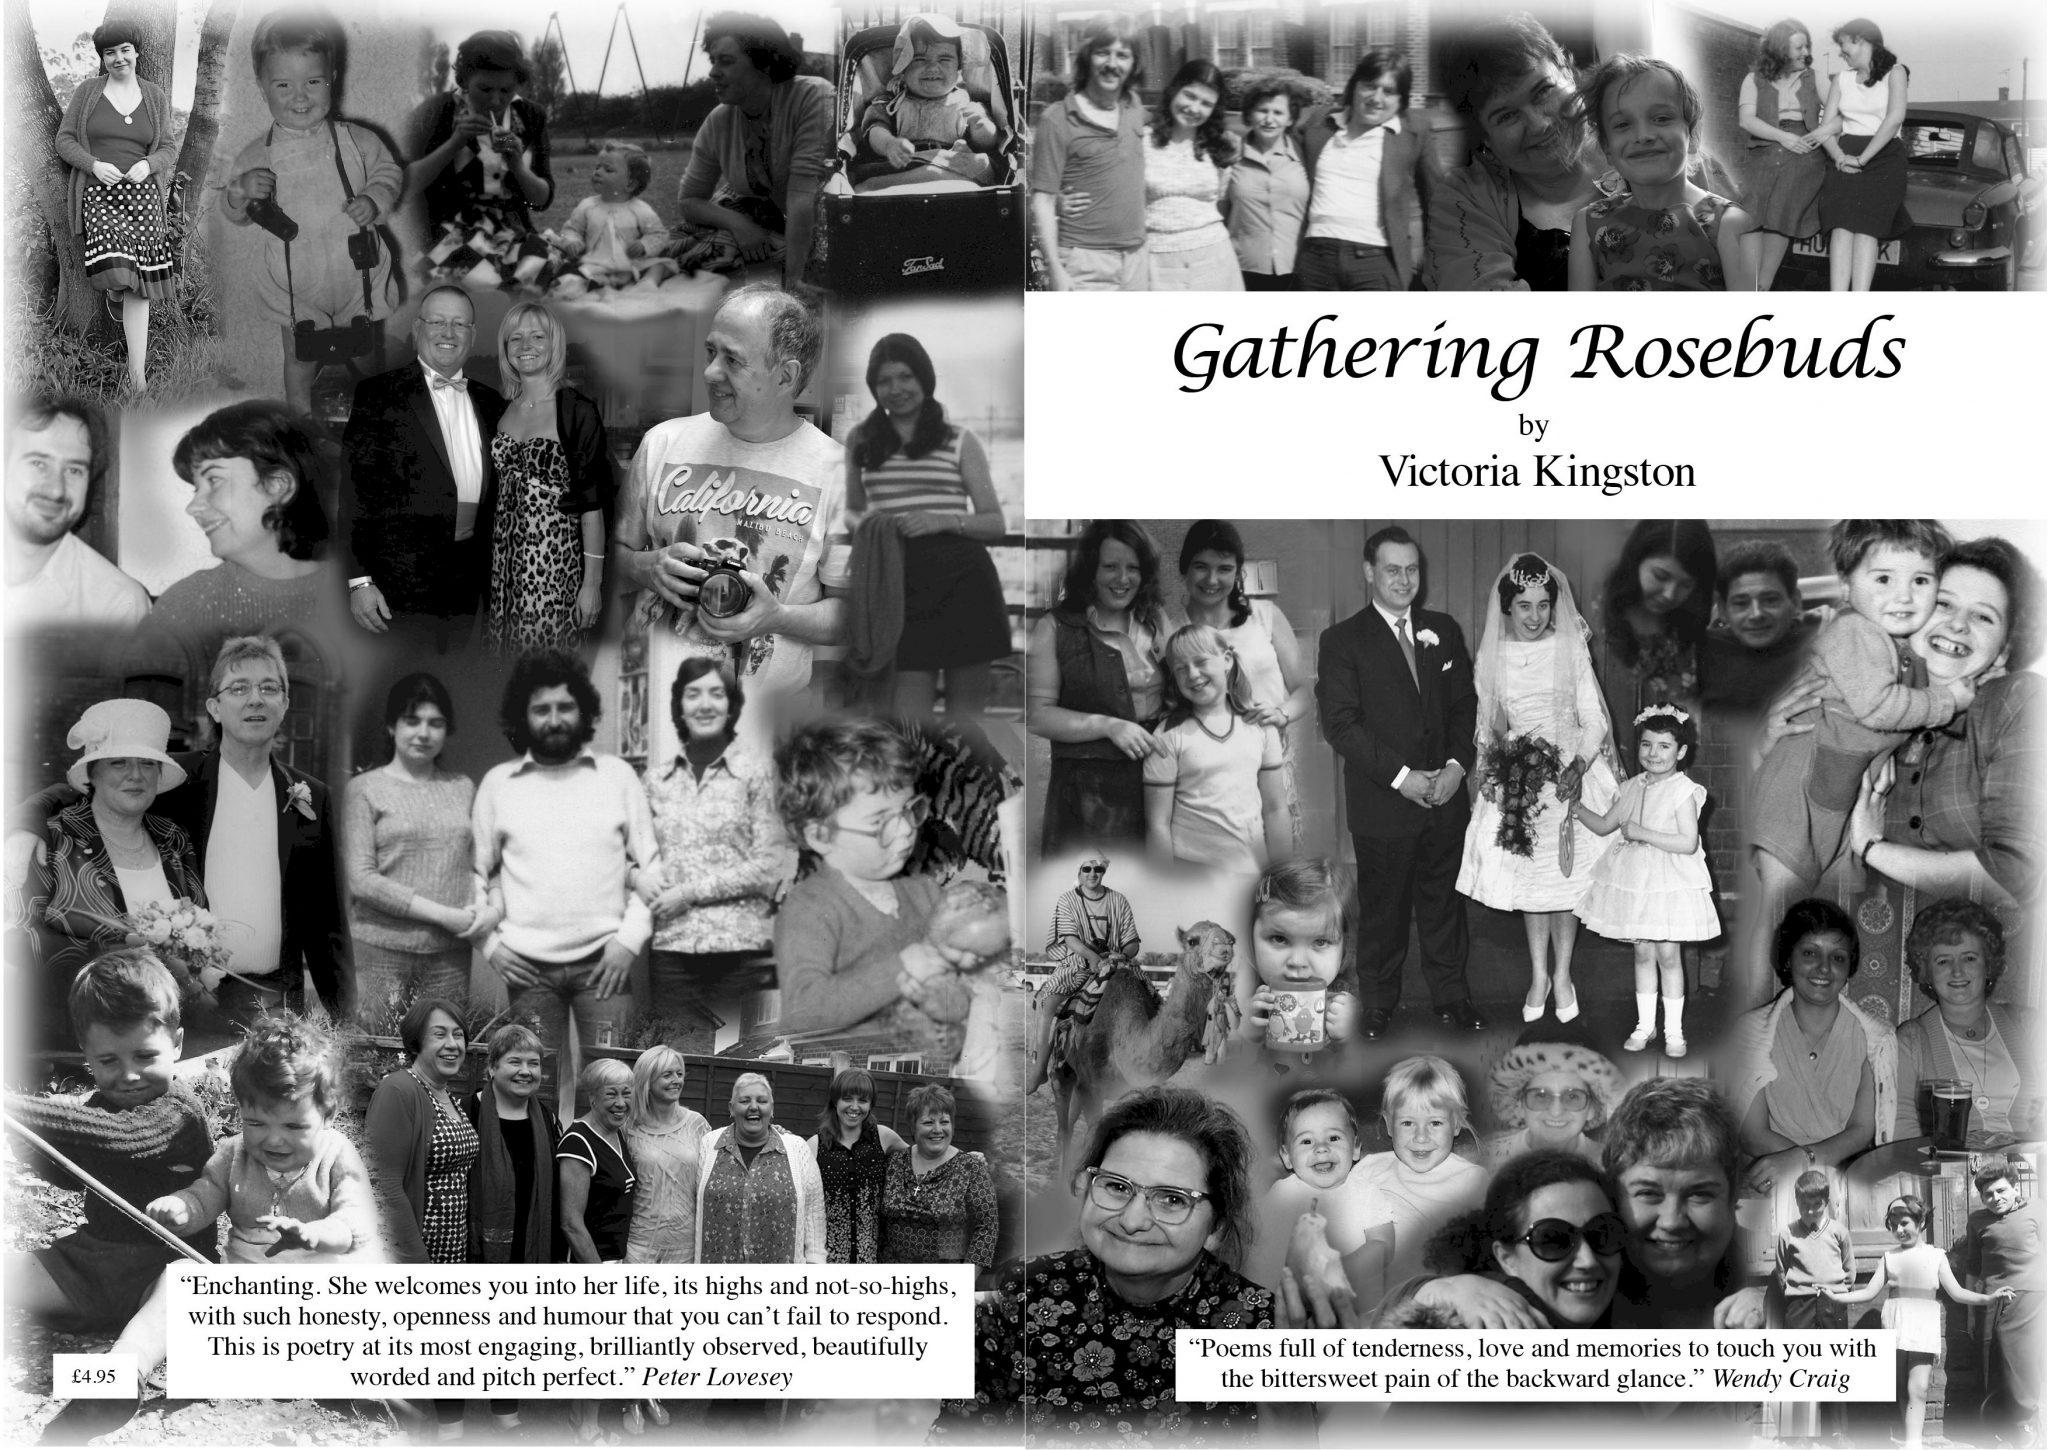 Book - Gathering Rosebuds